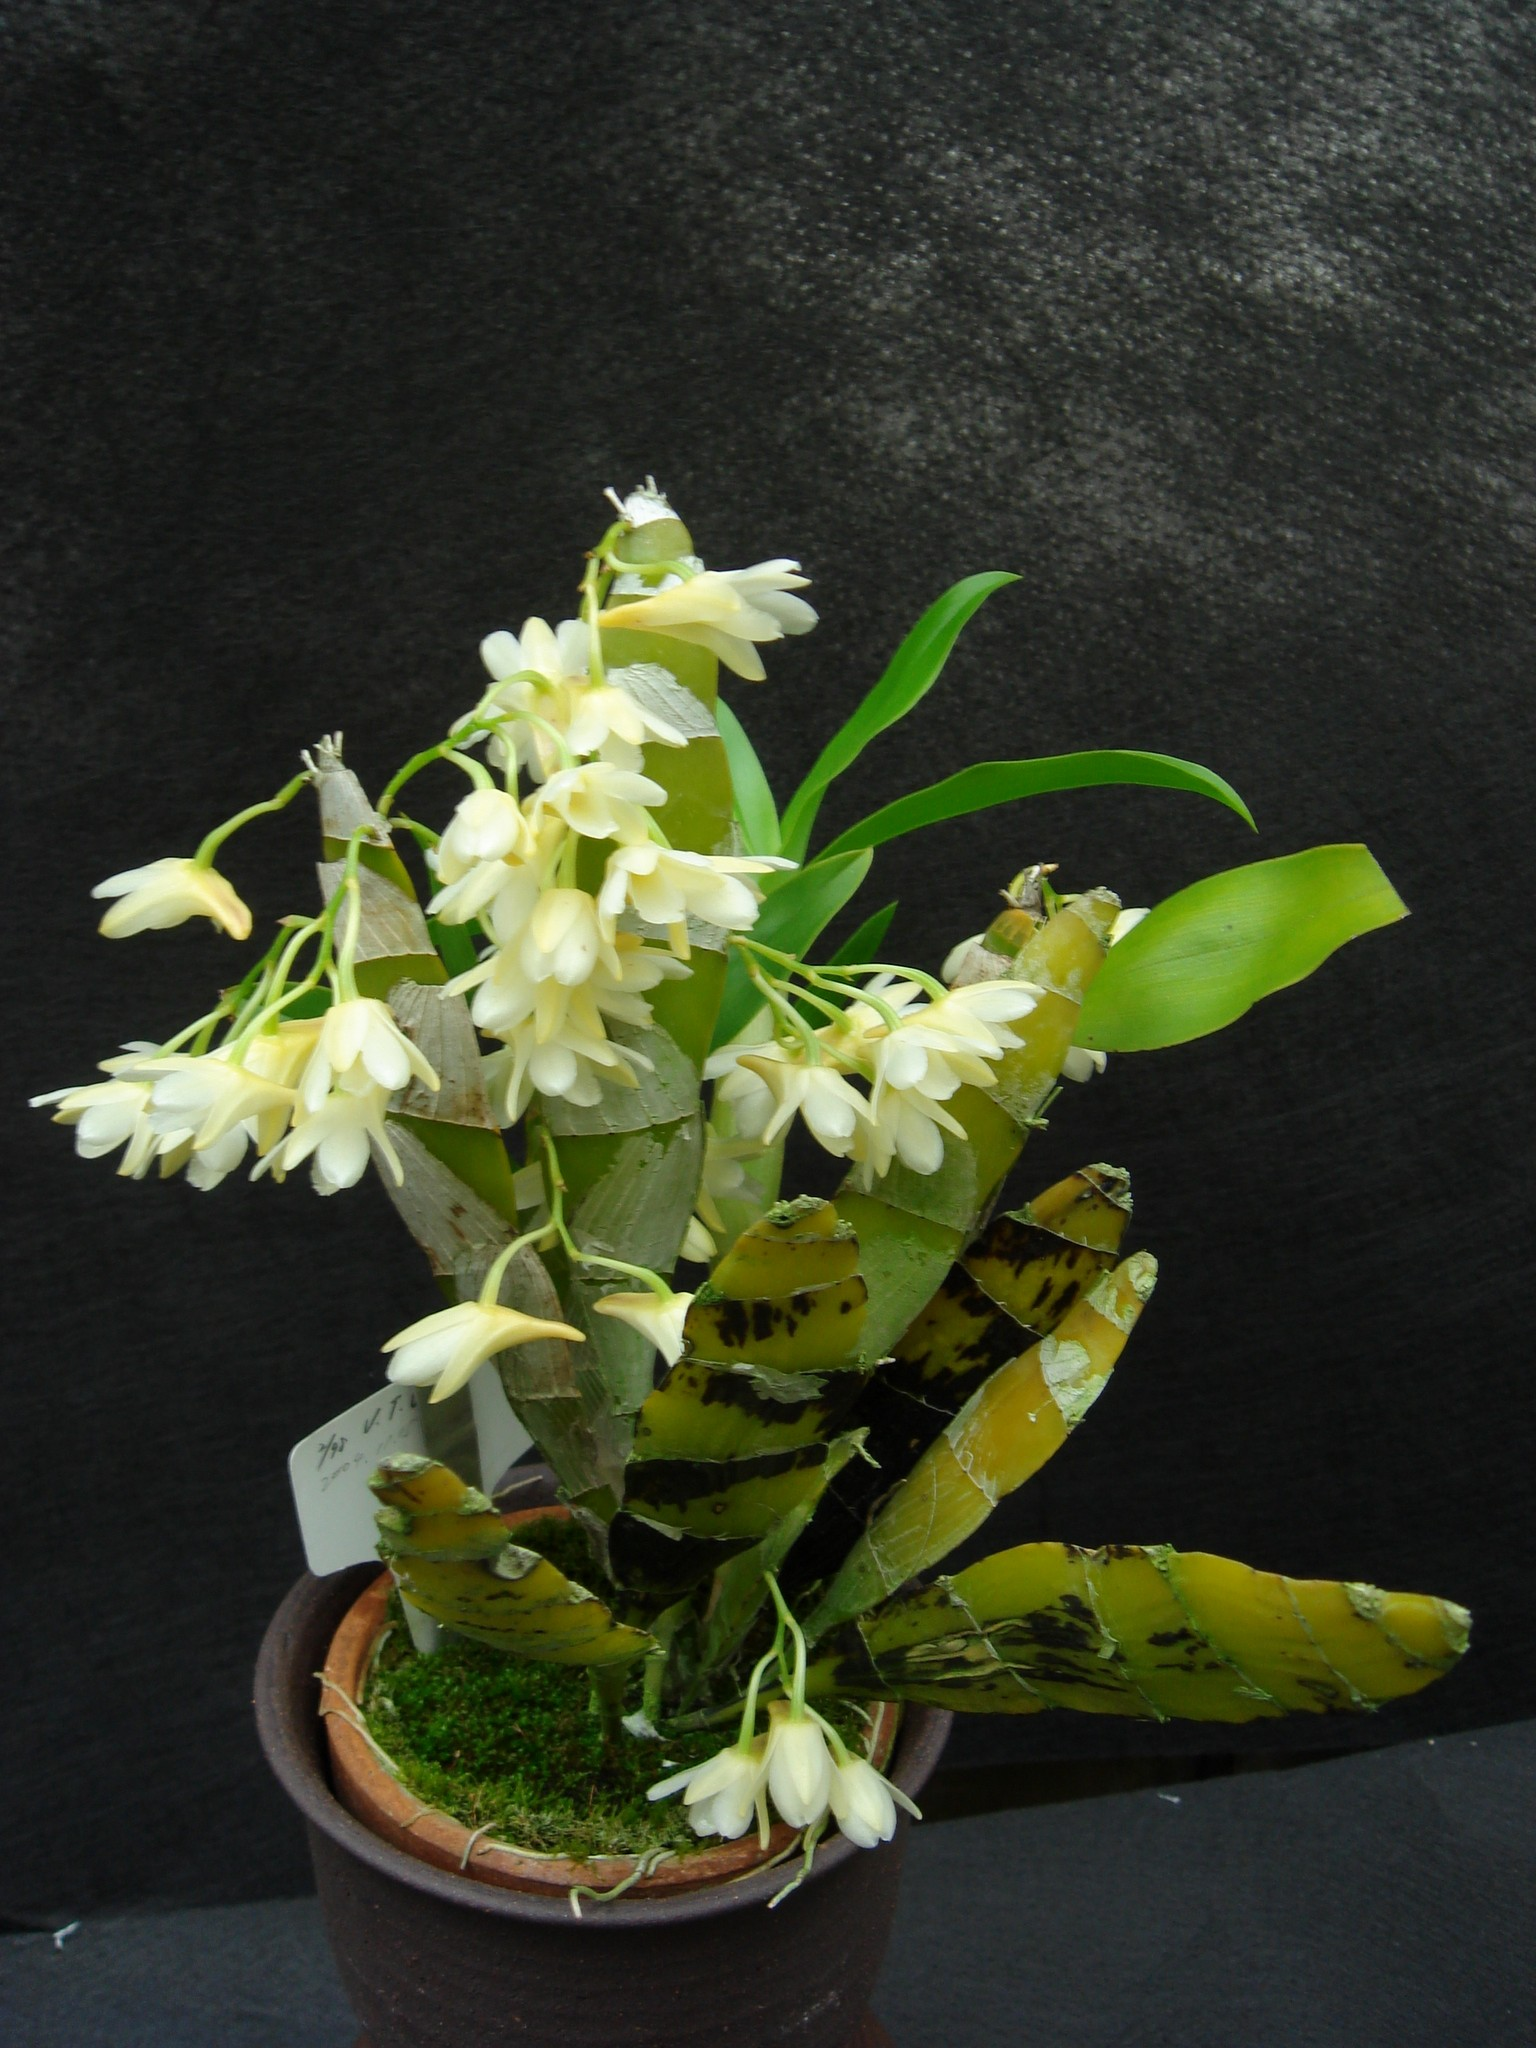 http://orchids.la.coocan.jp/Dendrobium/Dendrobium%20platygastrium/DSC01359.JPG